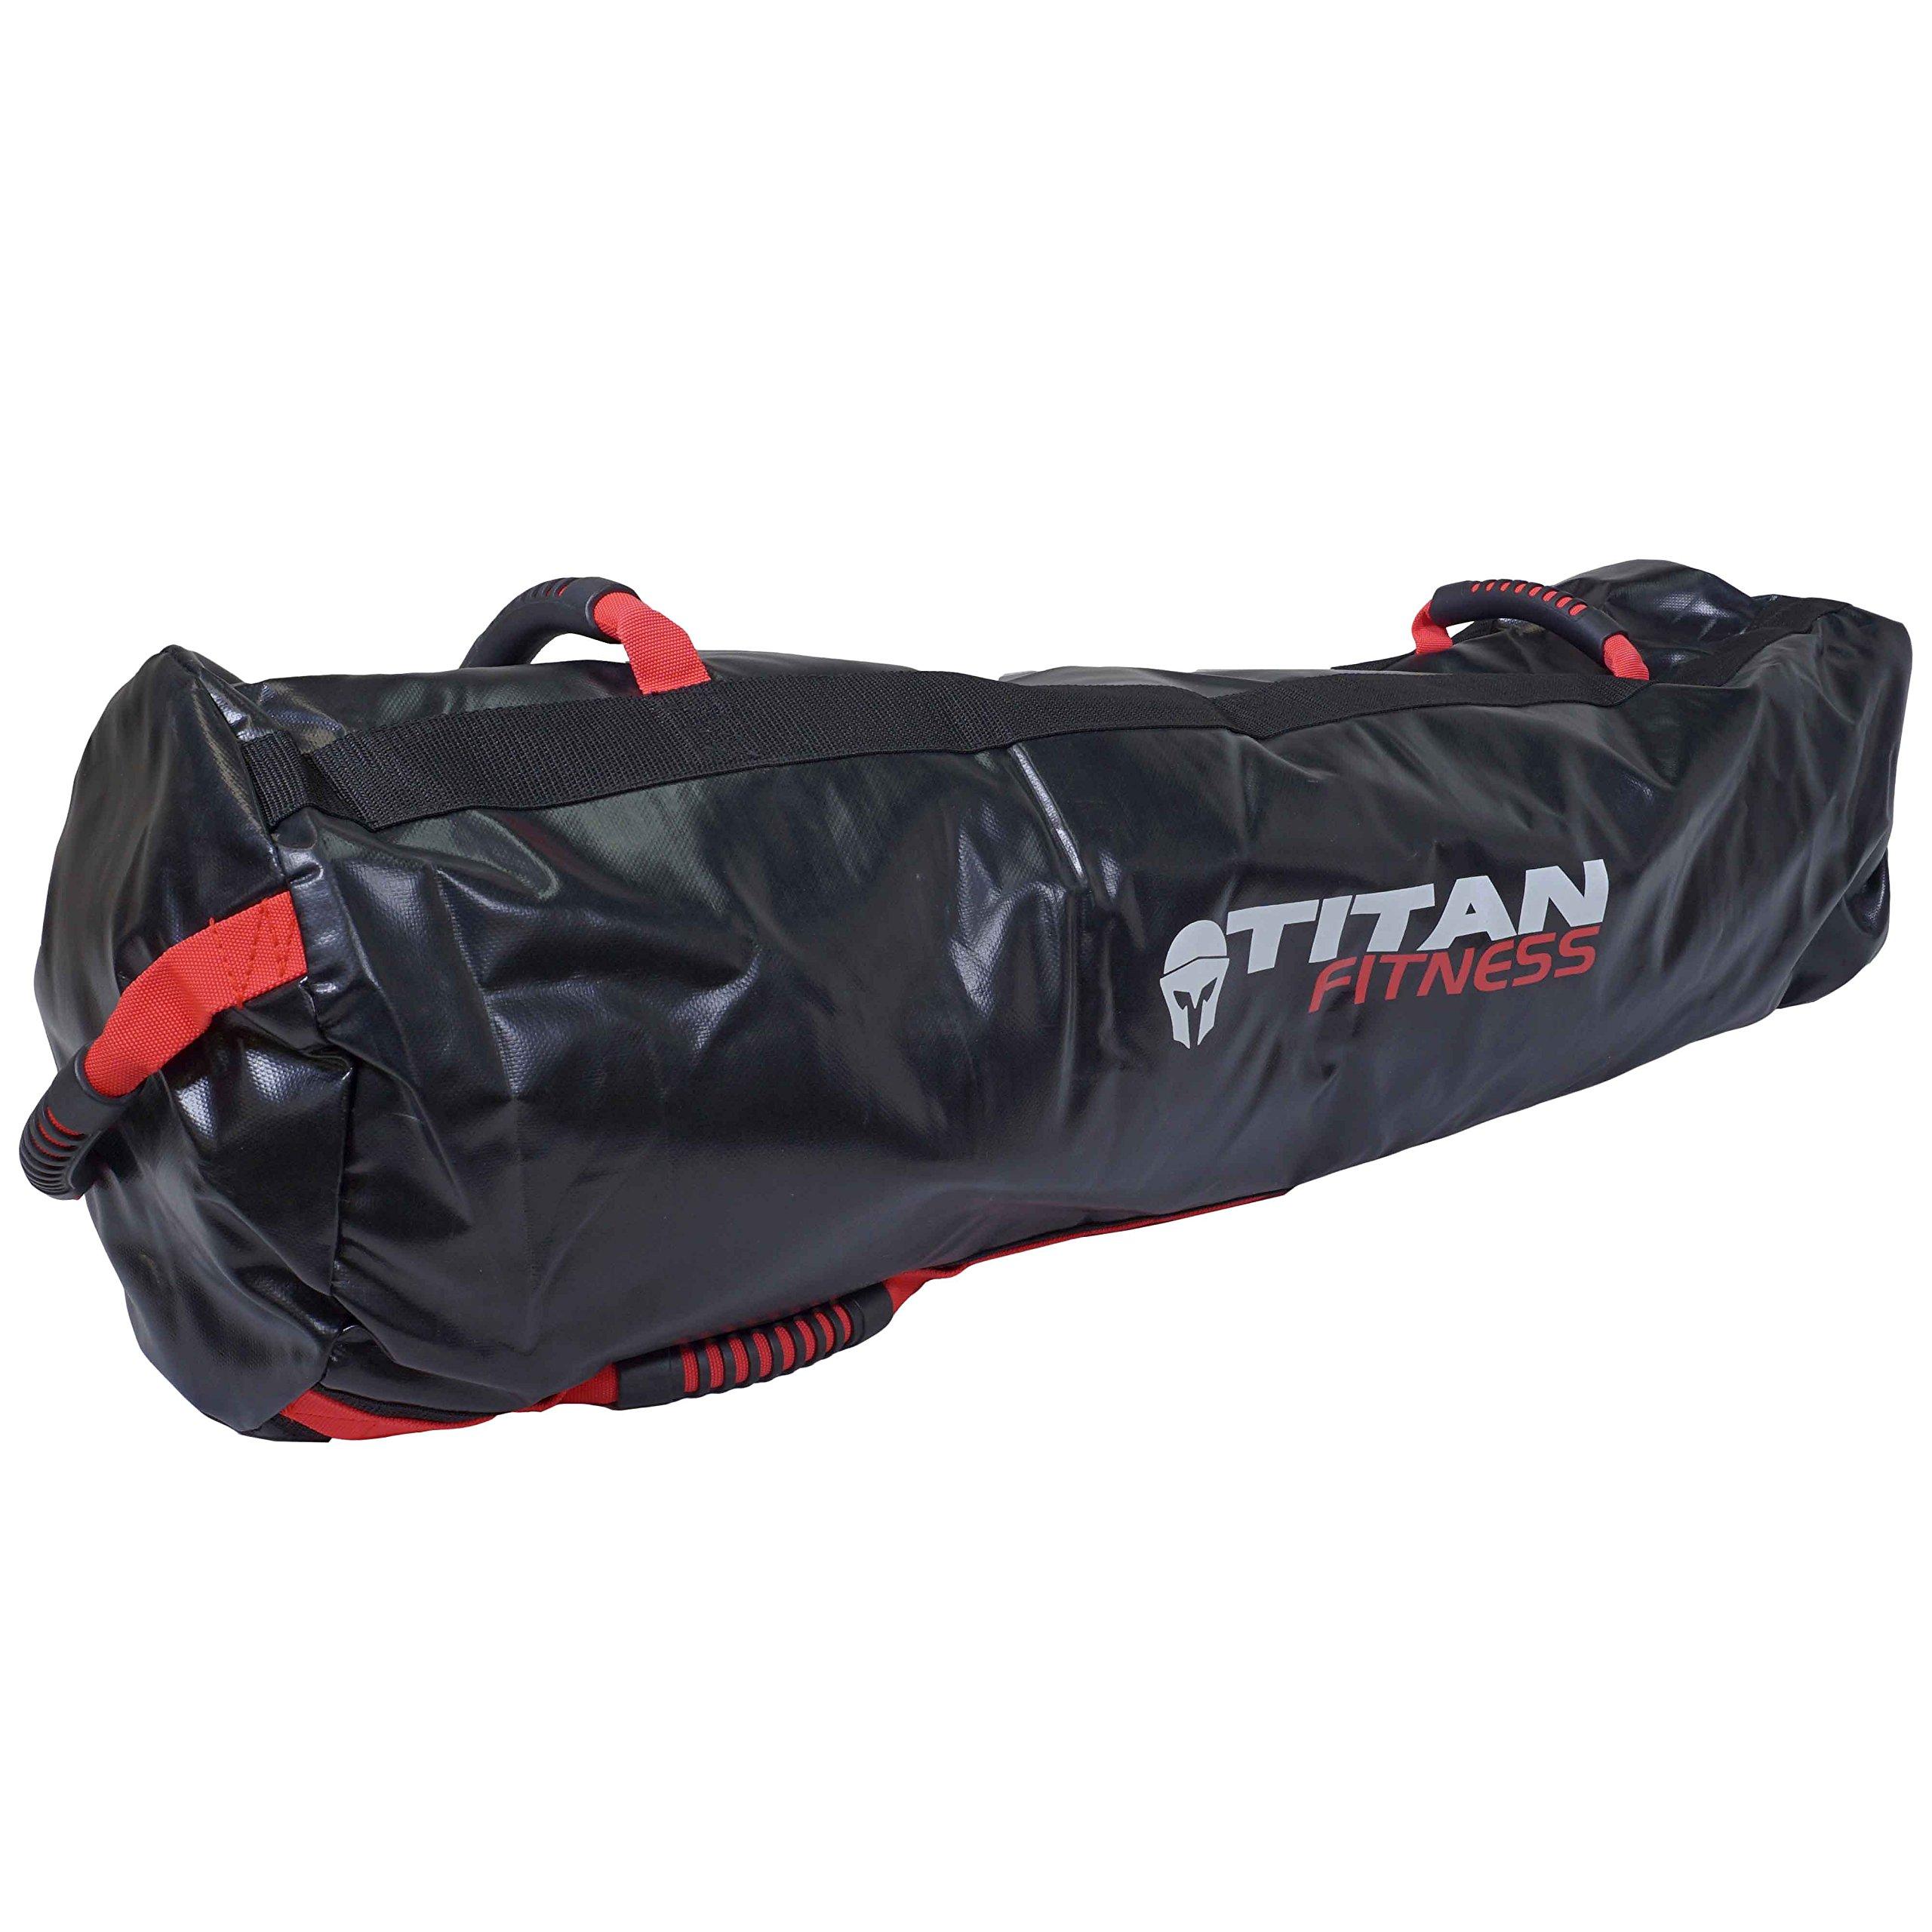 Titan Fitness 100 lb Heavy Duty Workout Weight Sandbag Exercise Training Bag